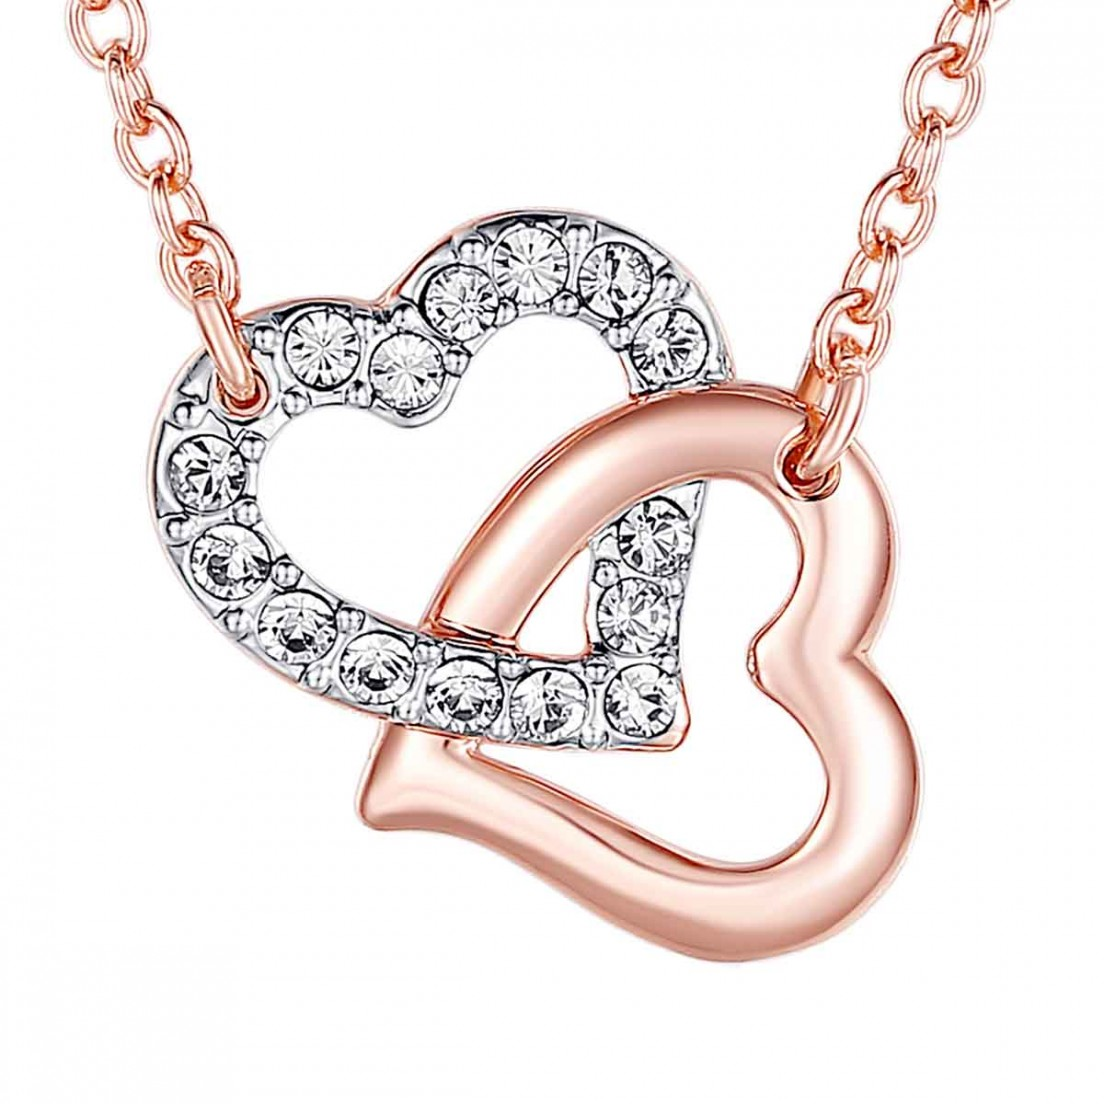 Collier - Coeurs avec cristaux Swarovski | Ideecadeau.fr